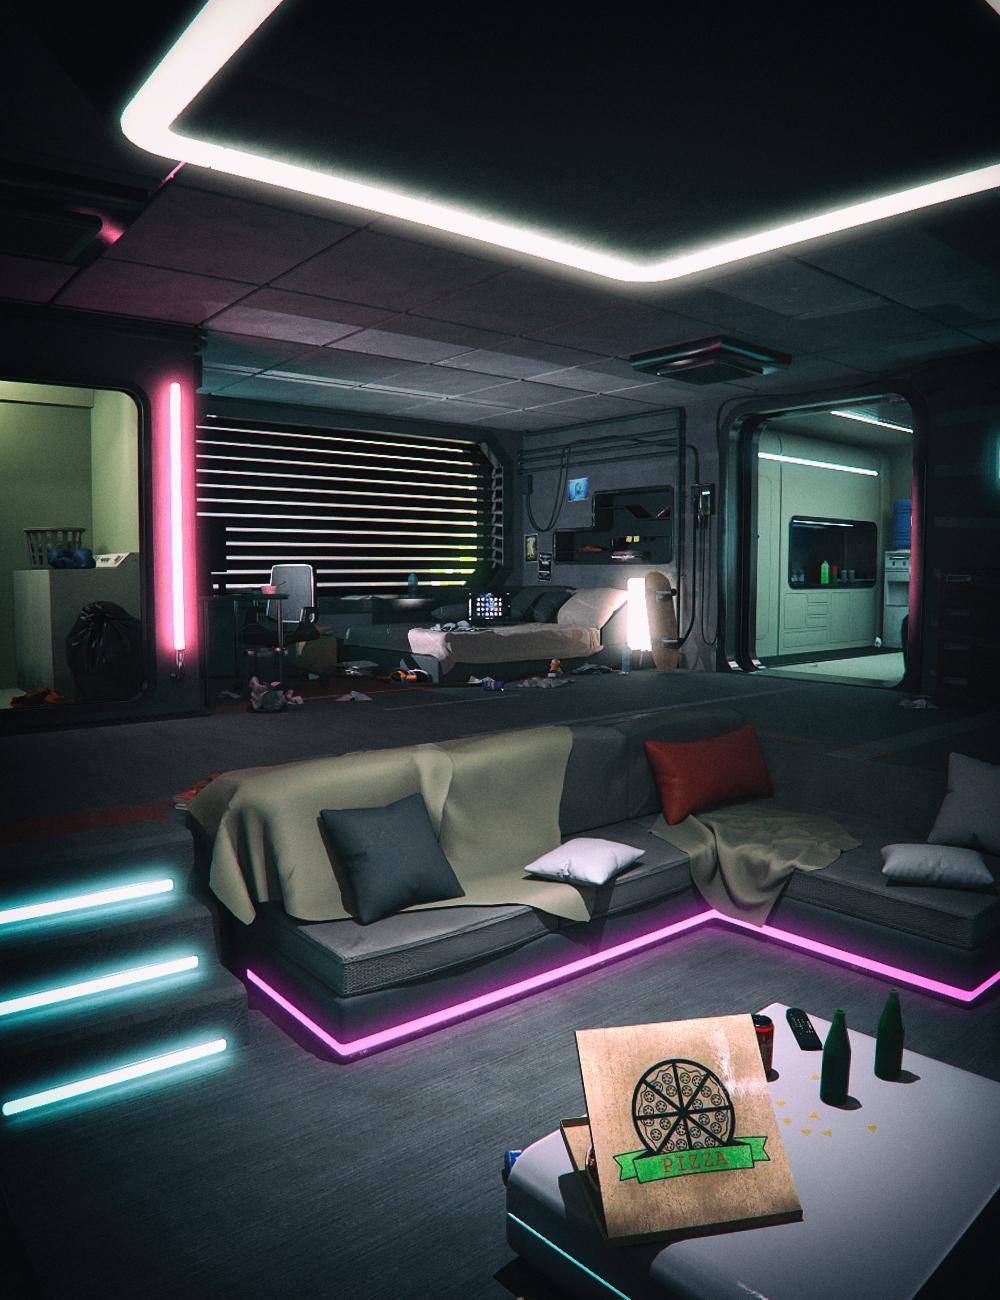 Cyberpunk Apartment by: Mely3D, 3D Models by Daz 3D